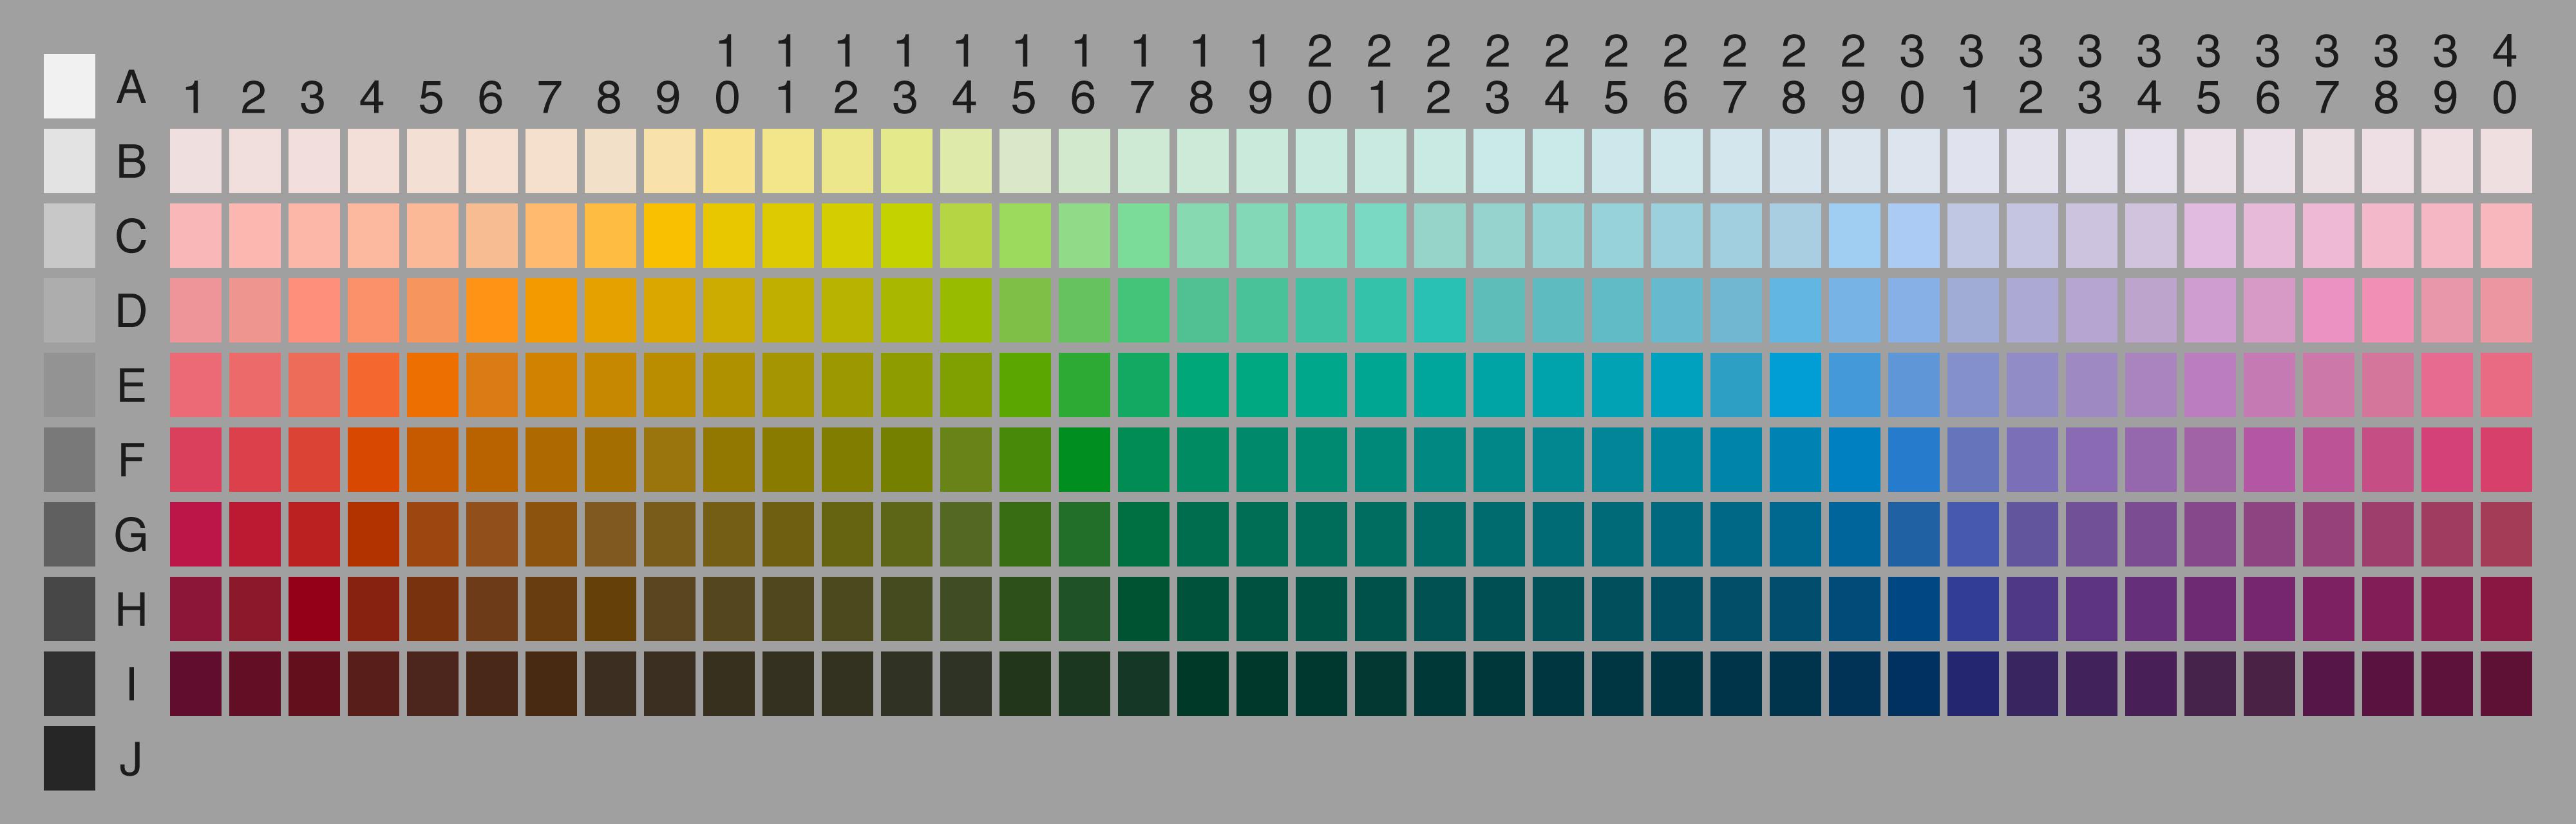 color chart online - Carnaval.jmsmusic.co